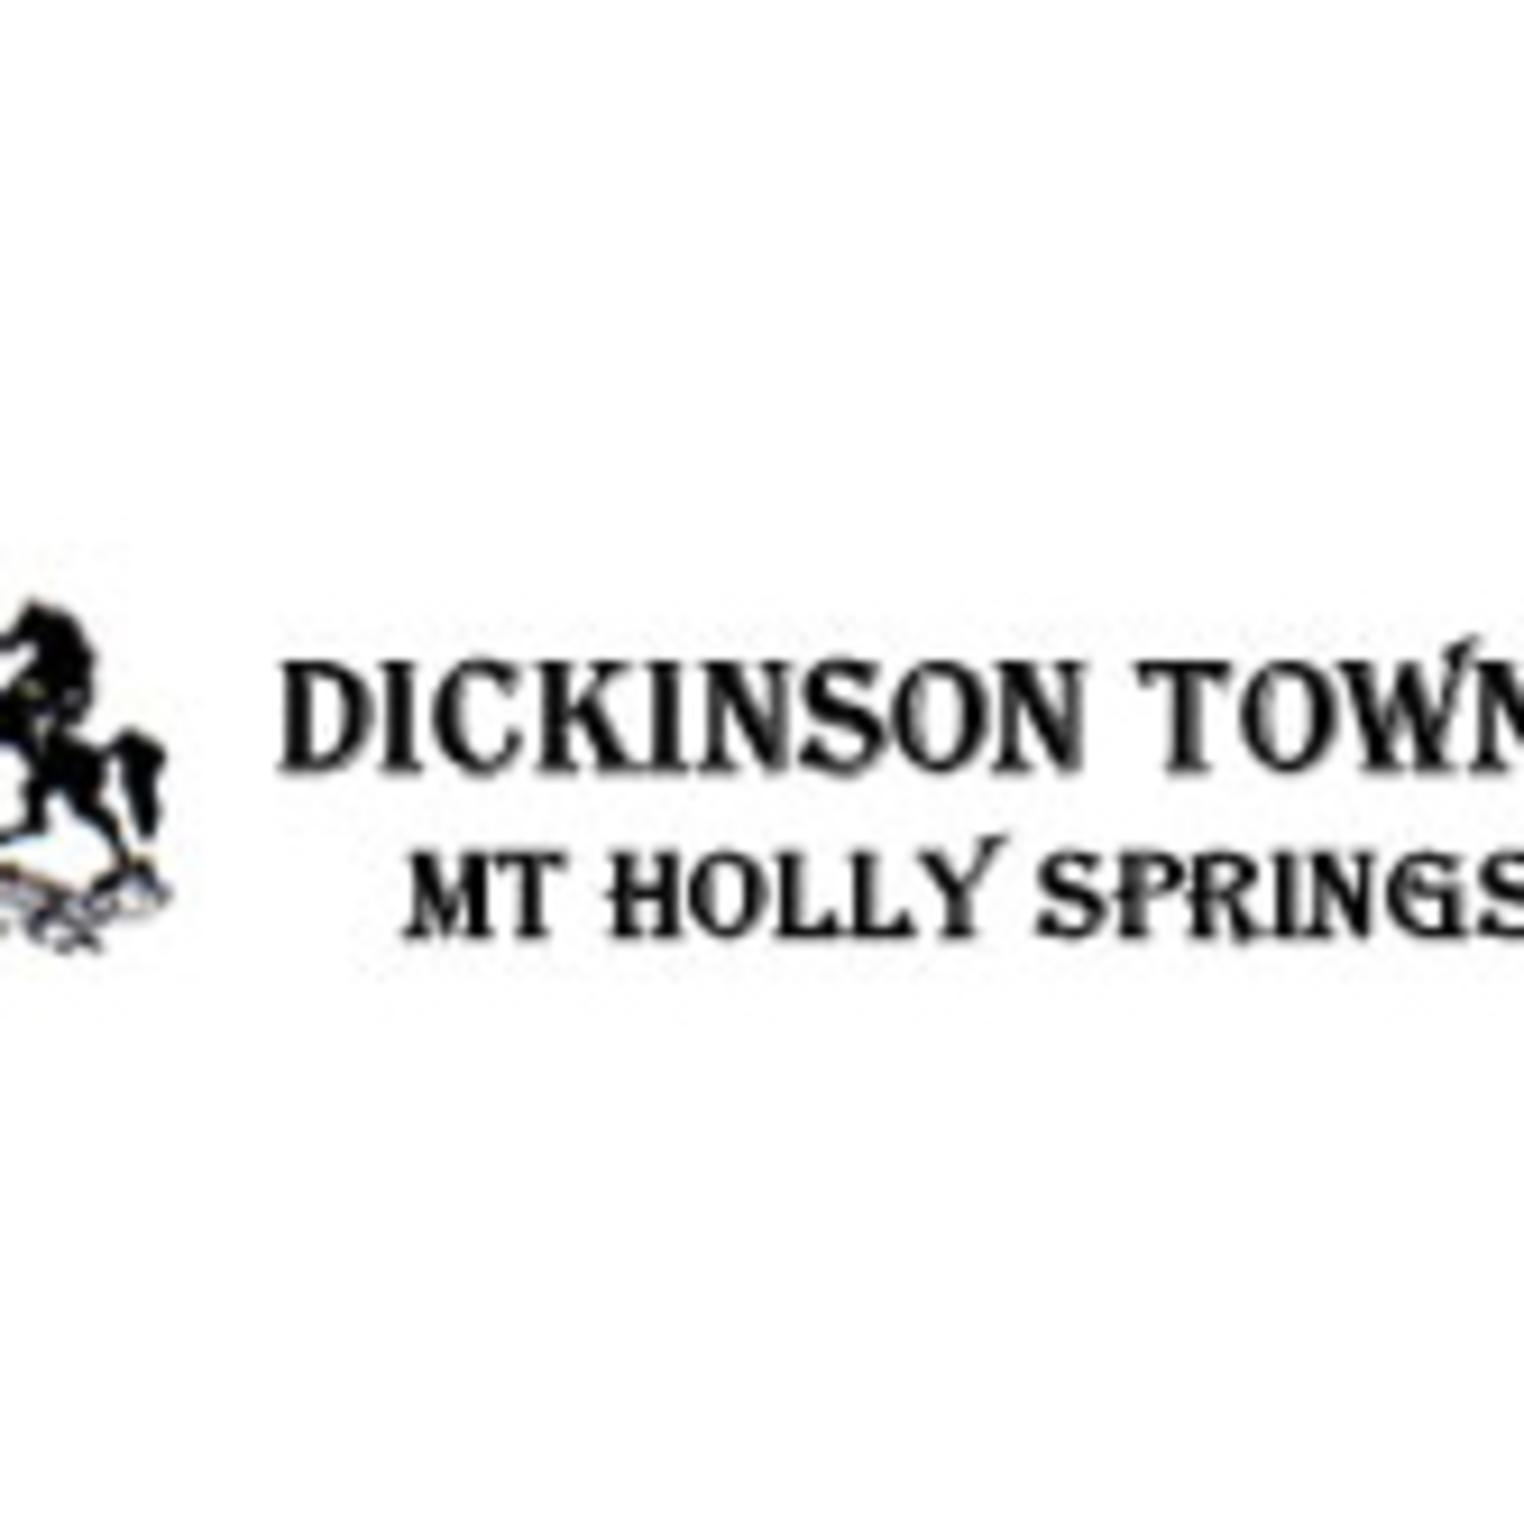 Dickinson Township